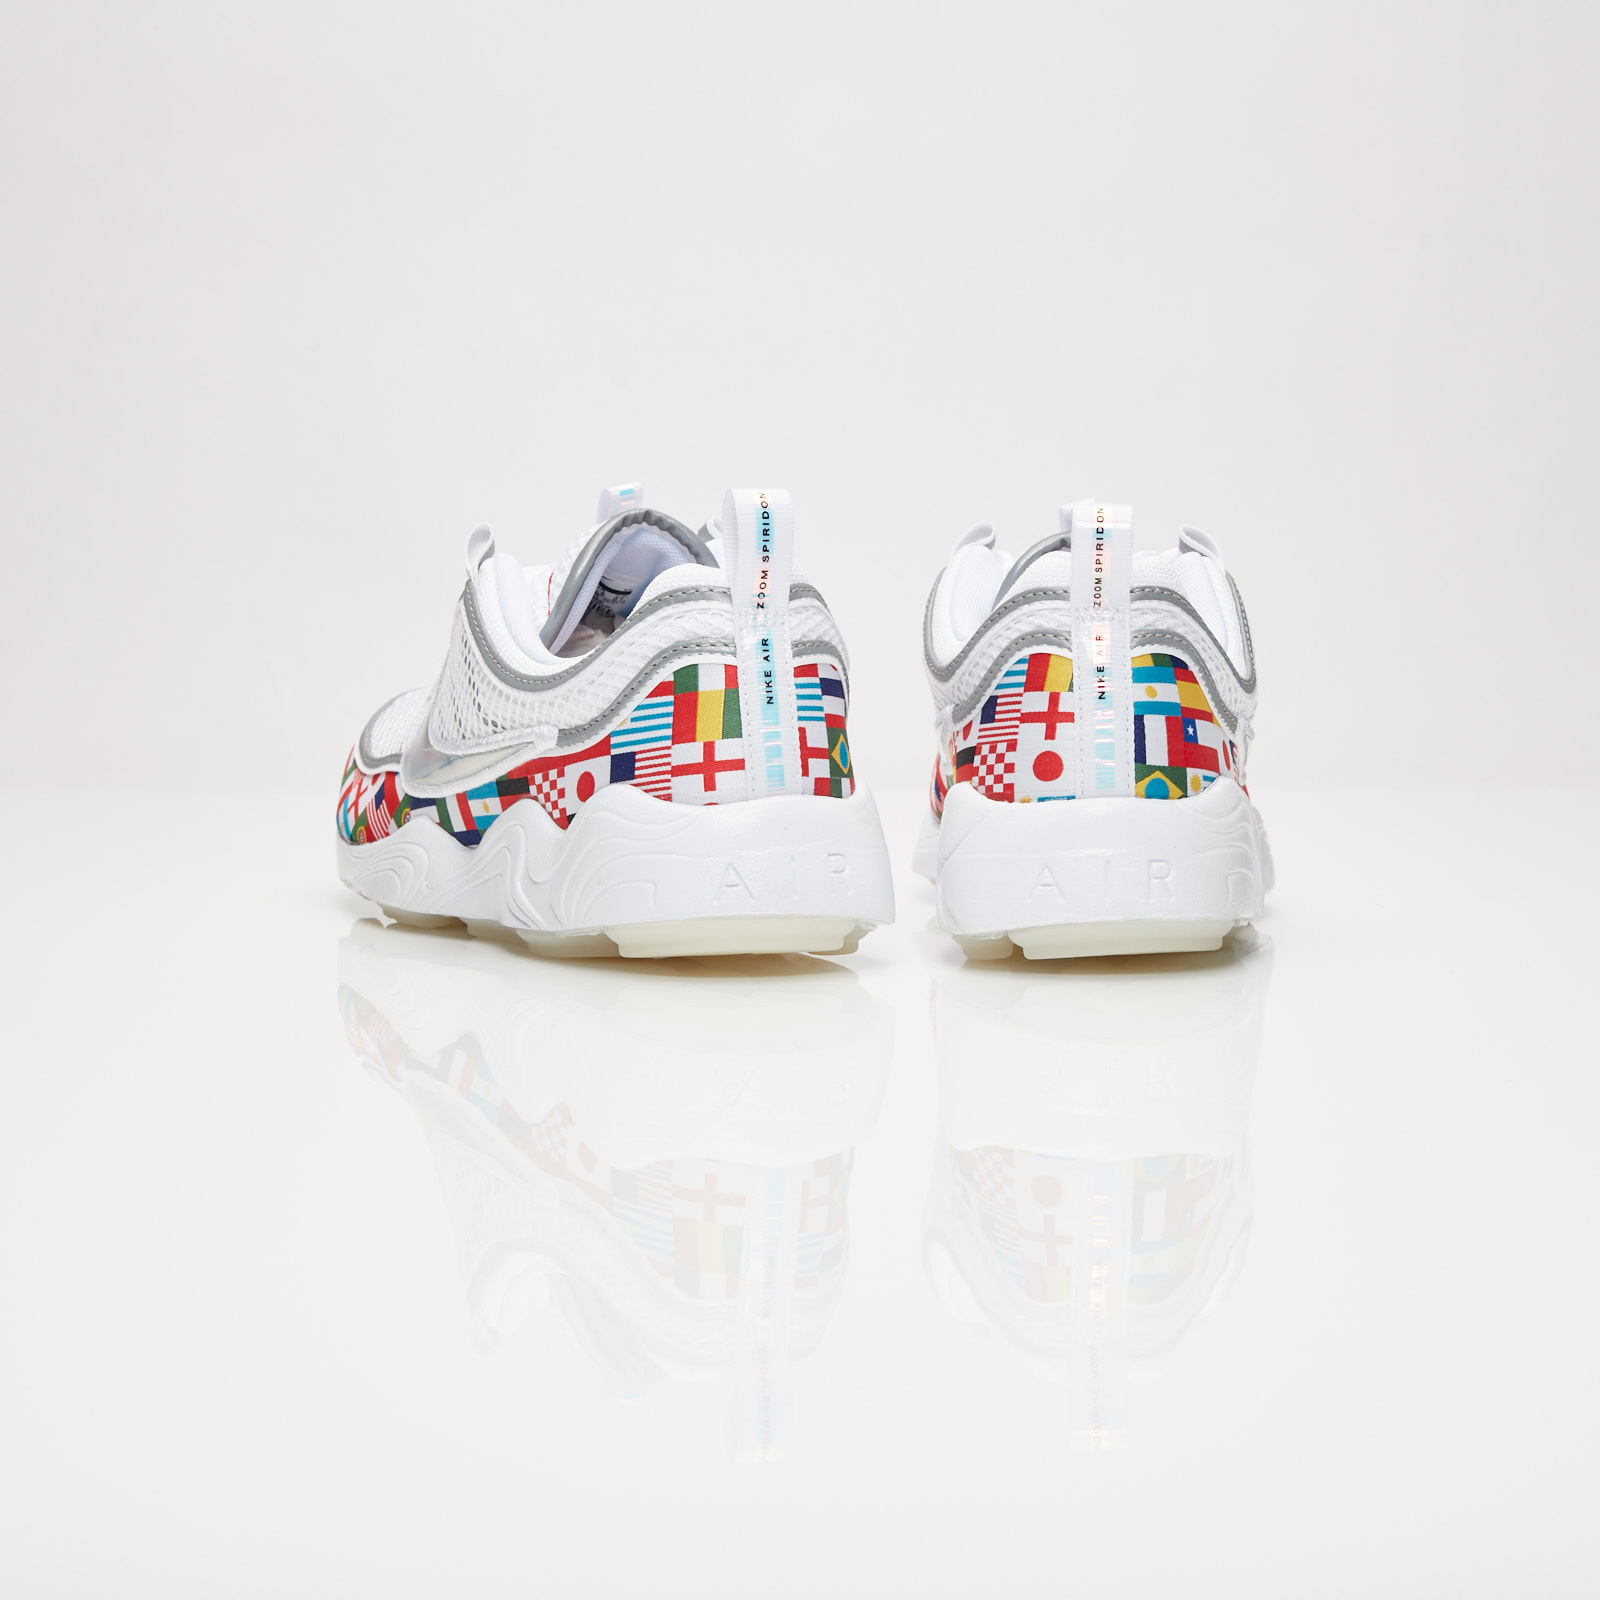 d872b5e6b039 Nike Air Zoom Spiridon 16 NIC QS - Ao5121-100 - Sneakersnstuff ...